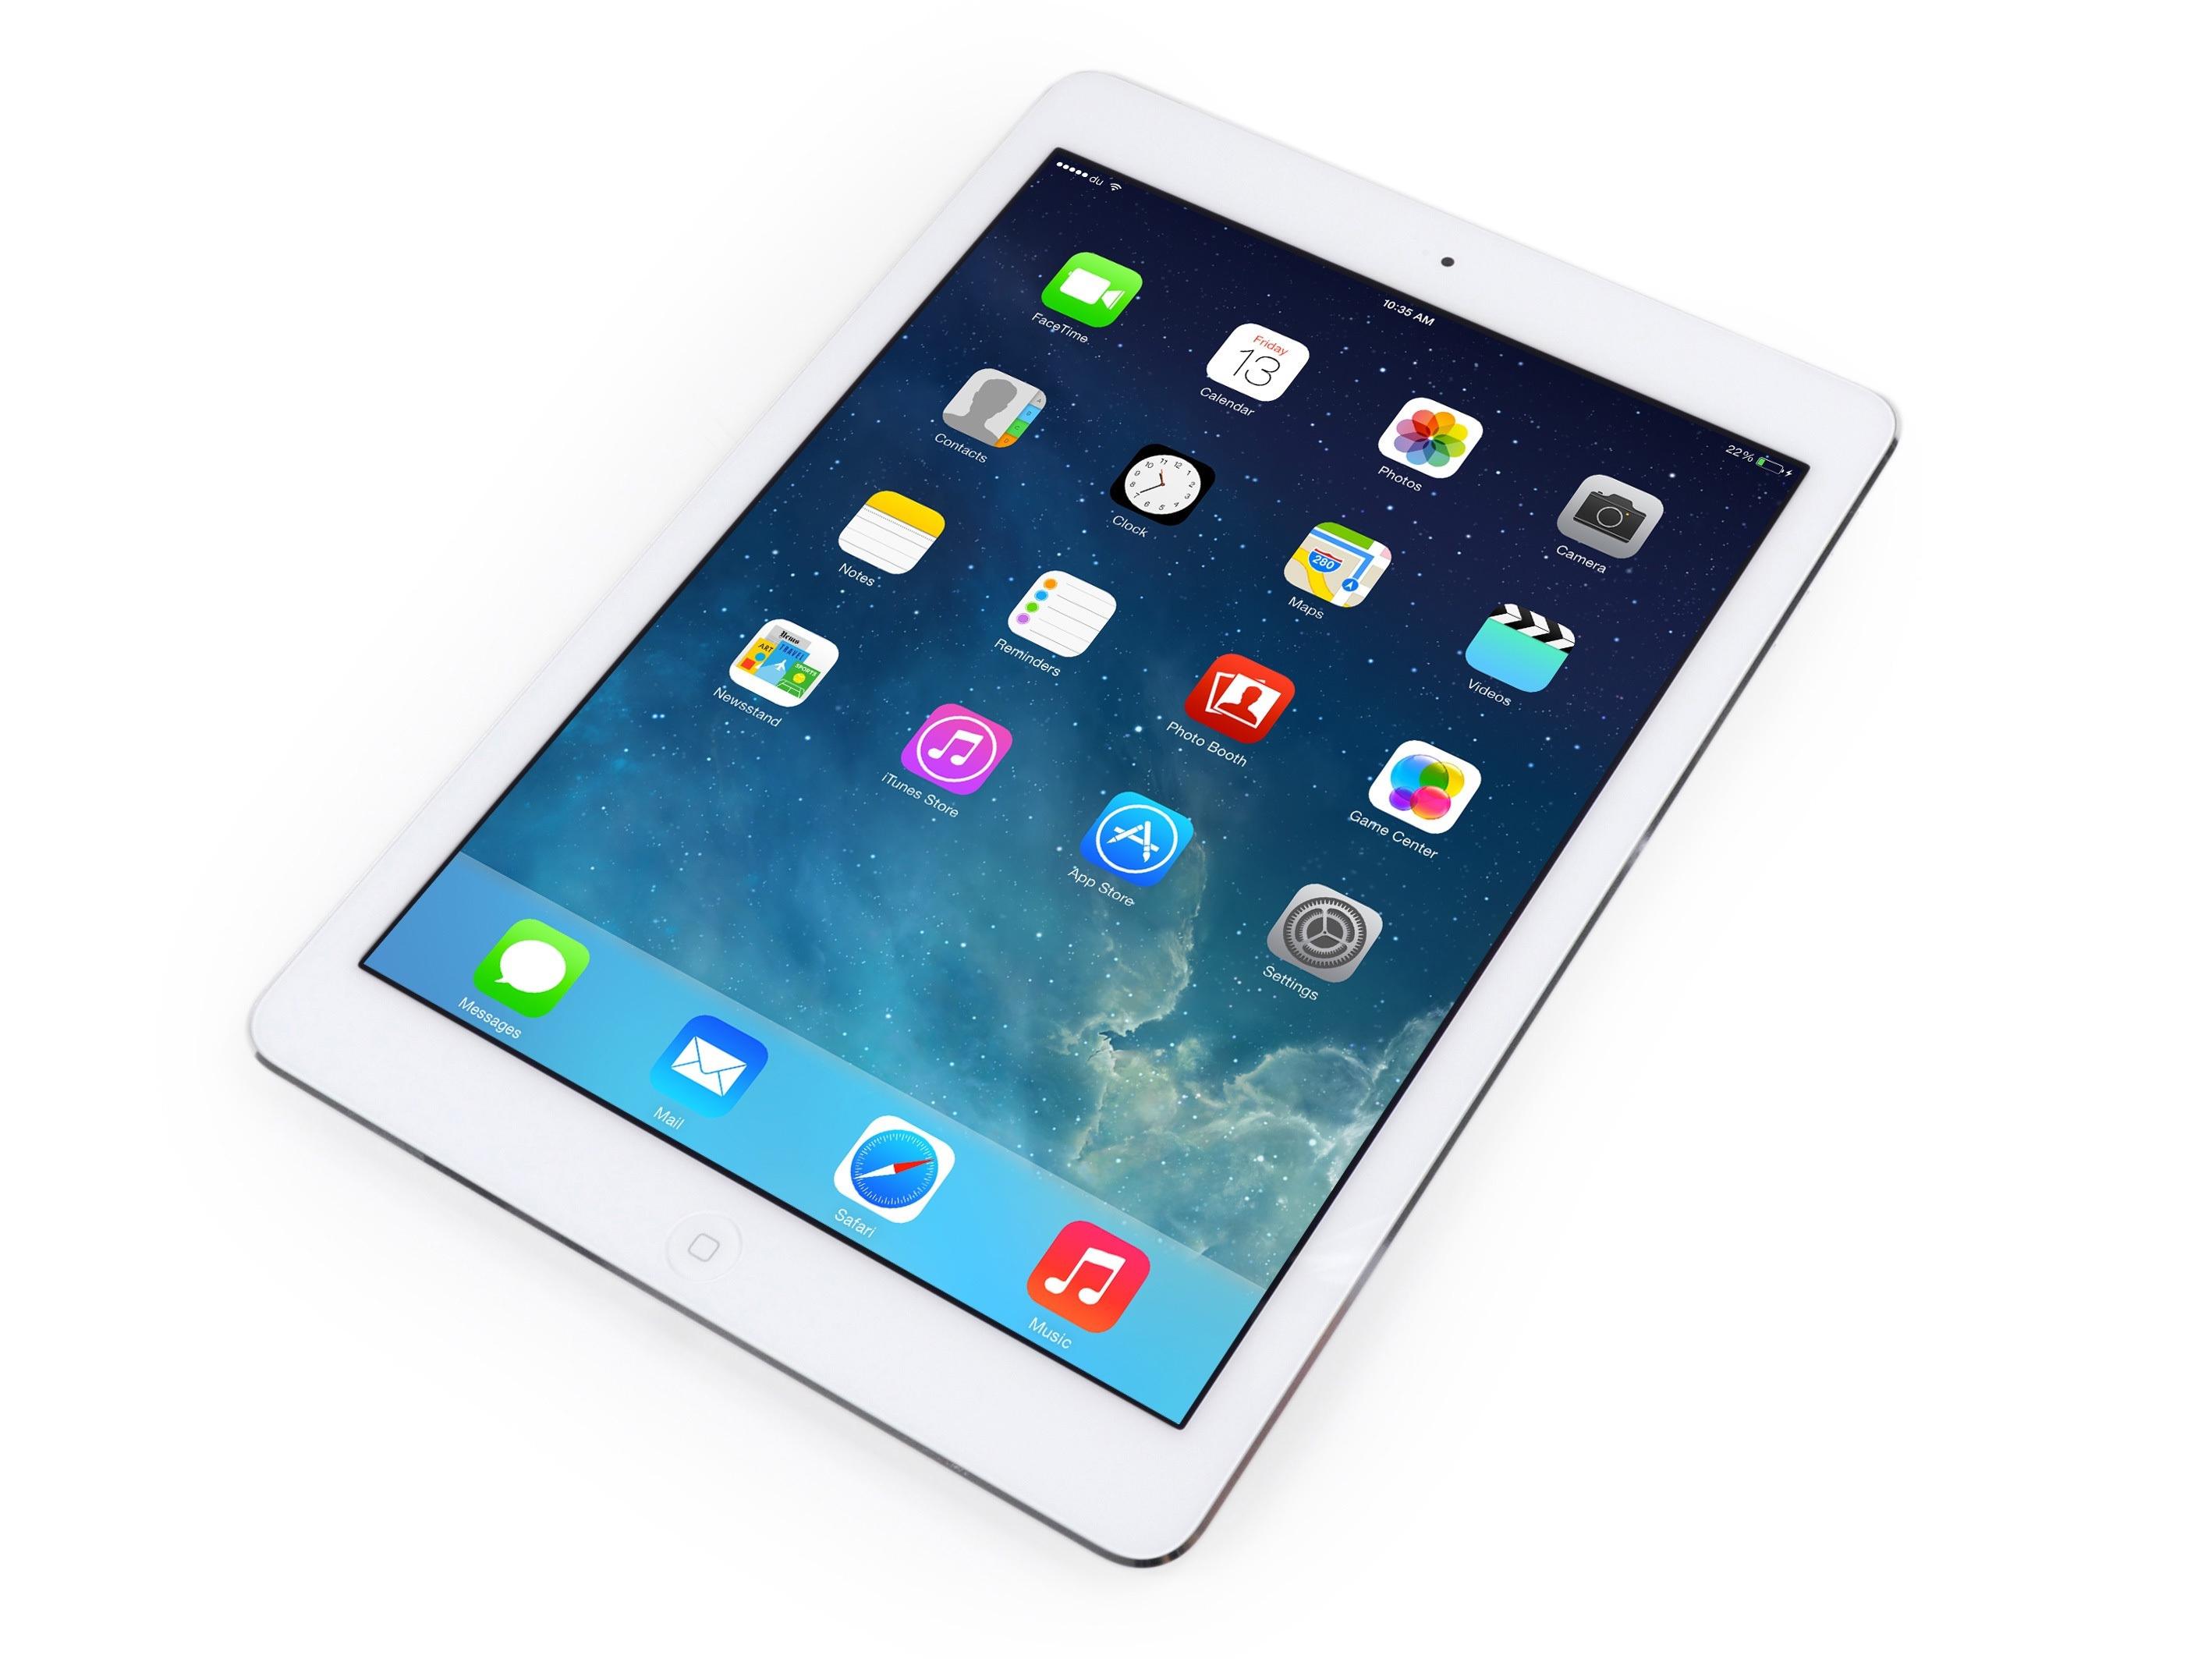 Apple Ipad Air 2 Background Ipad Air 2